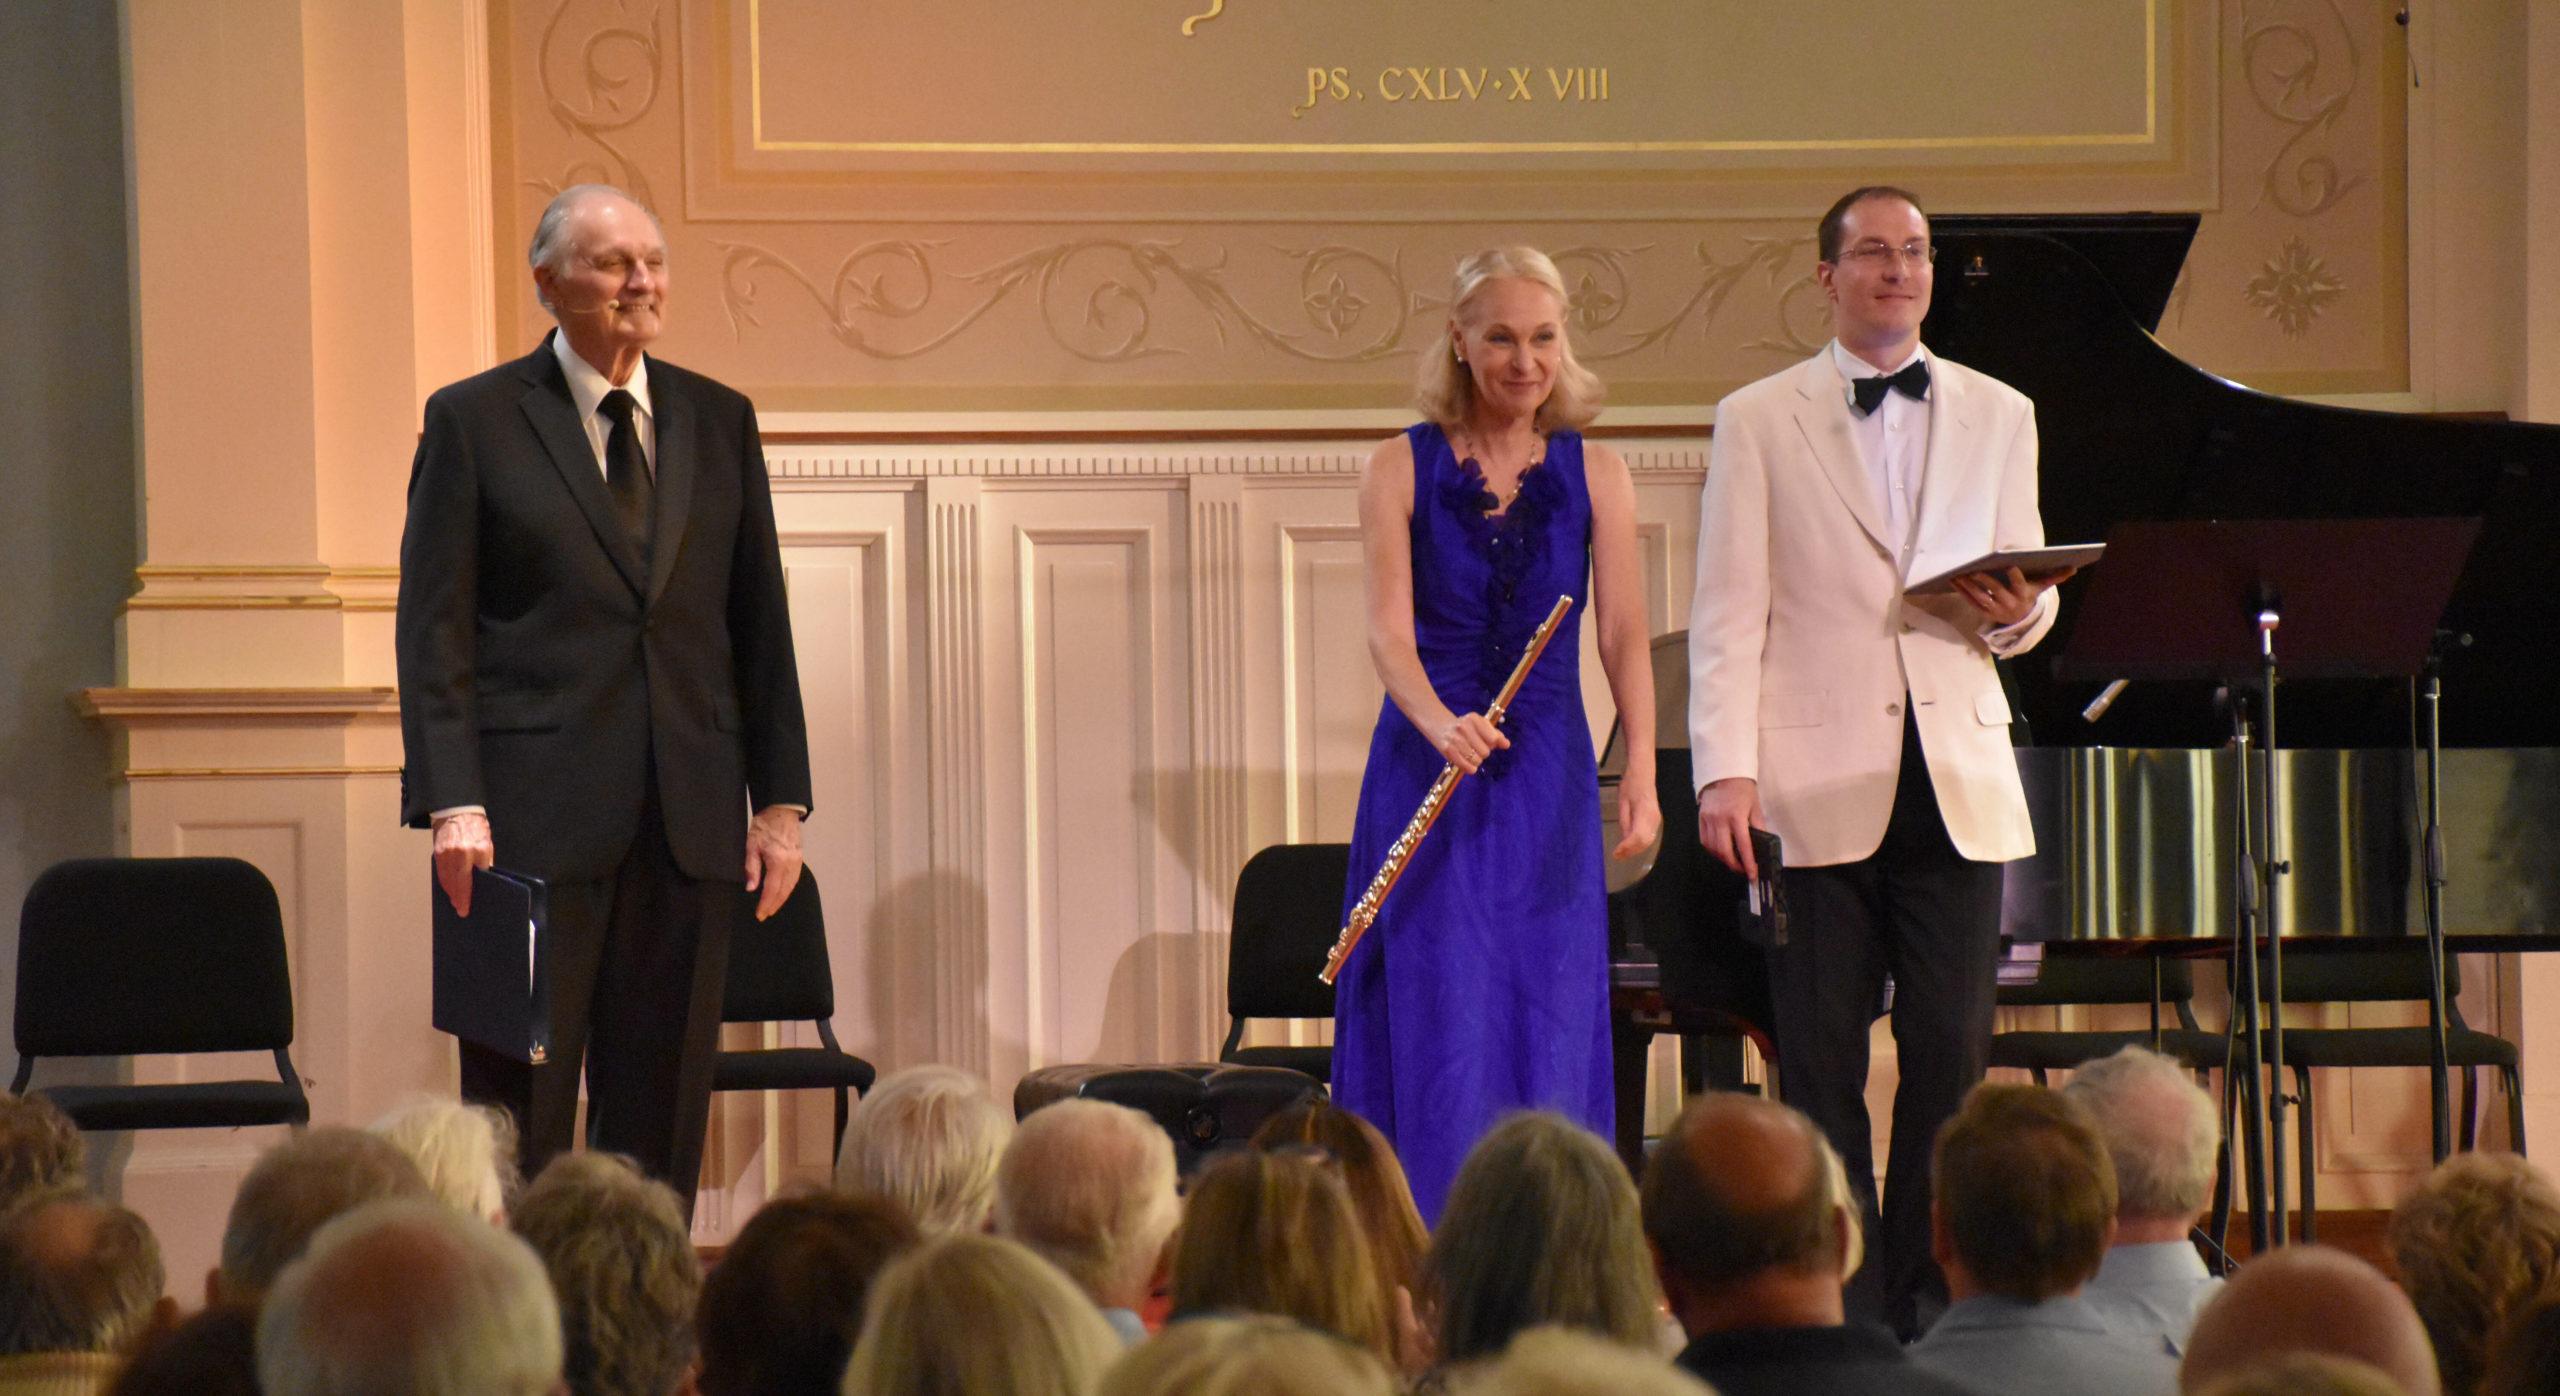 From left, Alan Alda, Marya Martin and Gilles Vonsattel at a 2017 concert of the Bridgehampton Chamber Music Festival at the Bridgehampton Presbyterian Church.